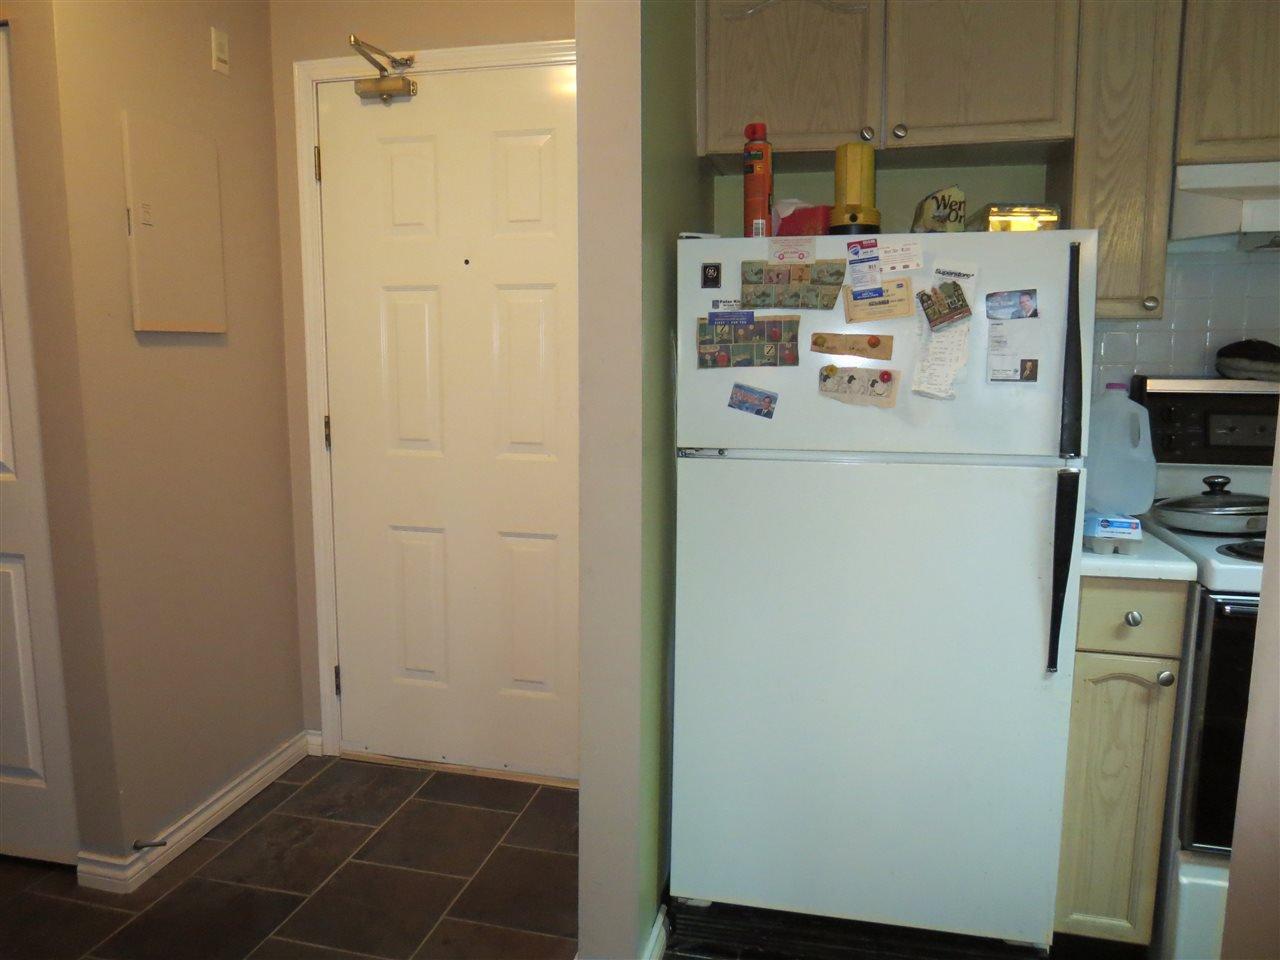 Photo 5: Photos: 317 98 LAVAL Street in Coquitlam: Maillardville Condo for sale : MLS®# R2117700